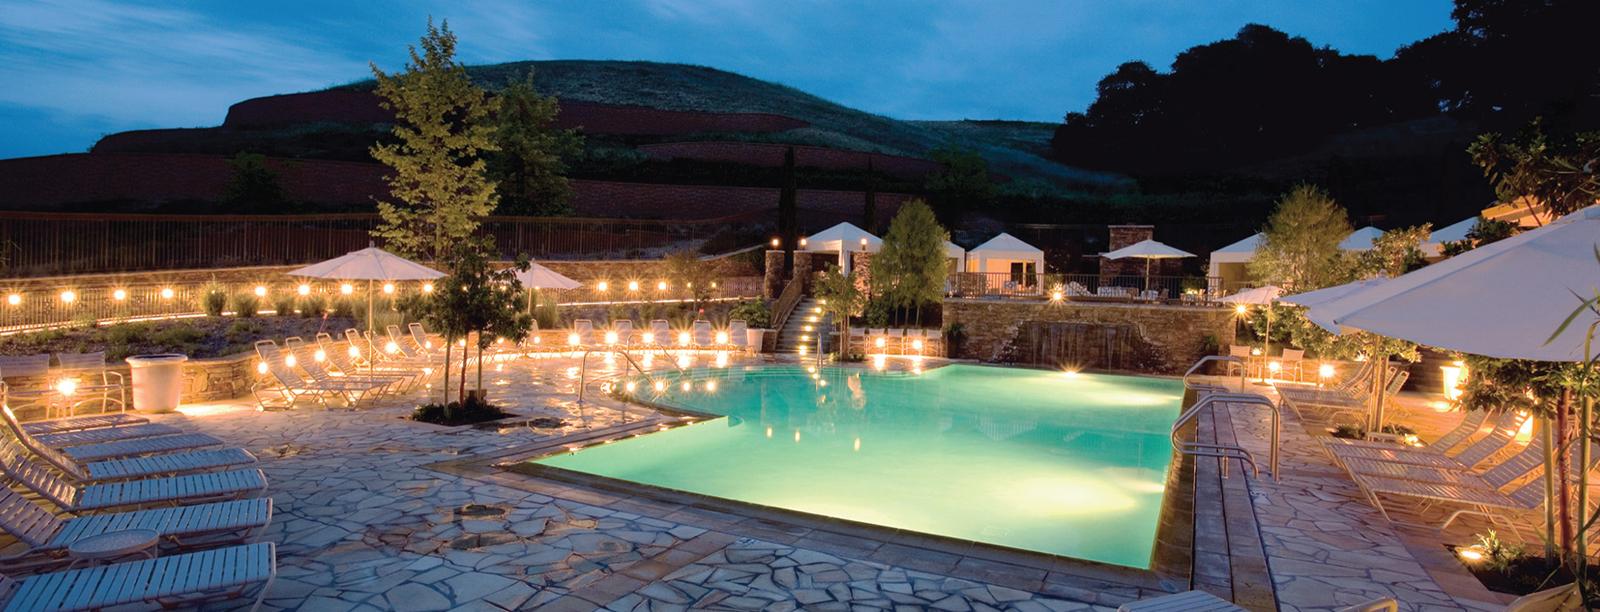 Cache Creek Casino Resort Brooks 的游泳池